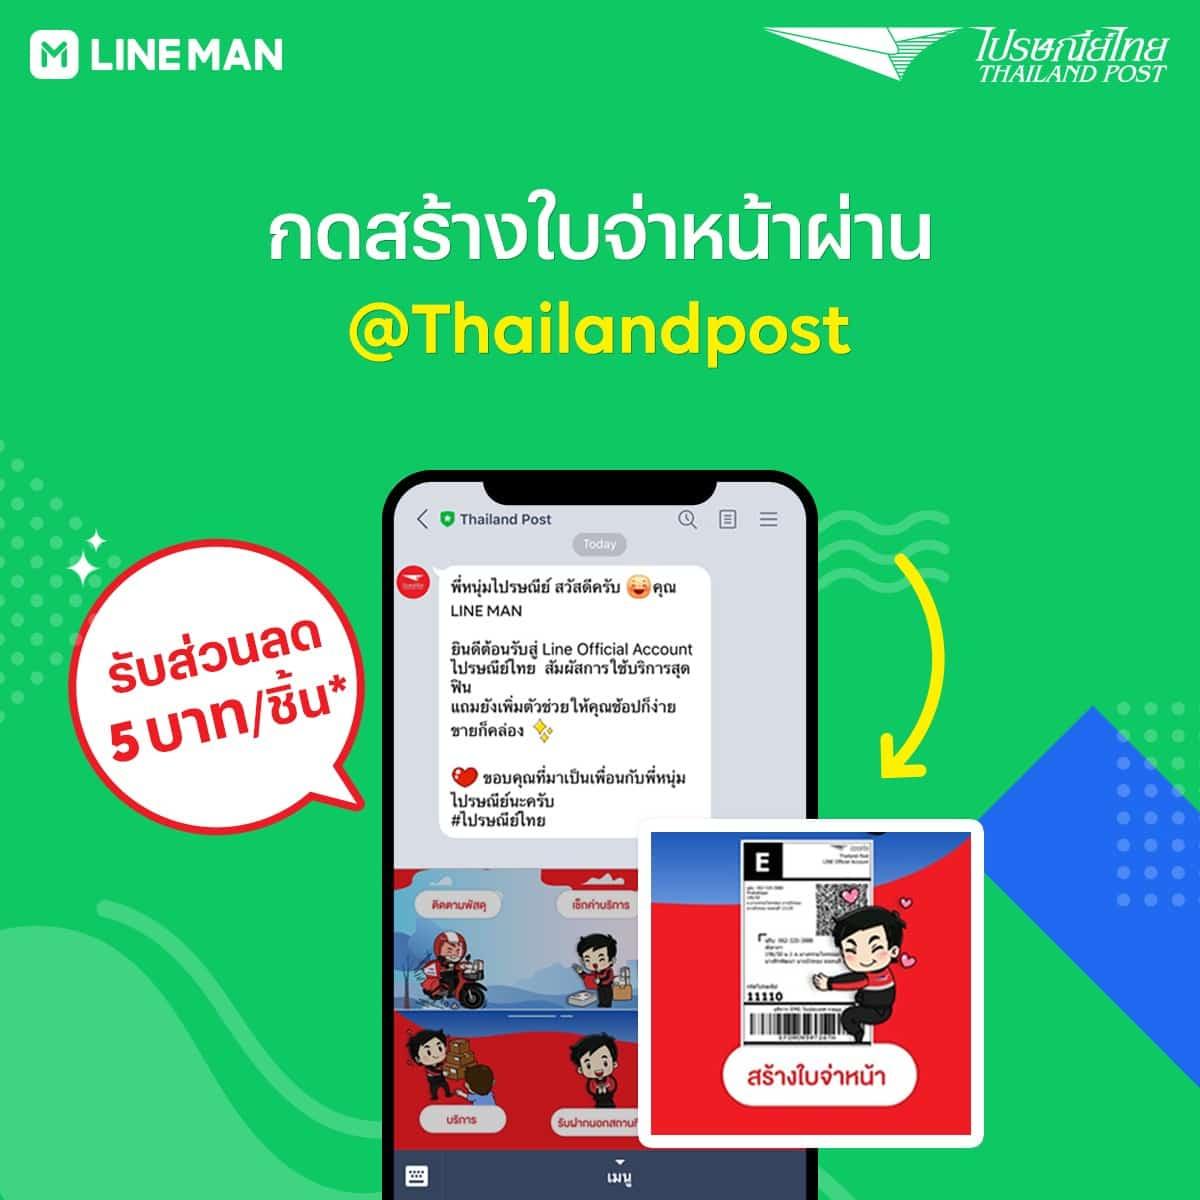 LINE Thailand Post 00001 - ไปรษณีย์ไทย ลดค่าส่ง 5 บาทต่อกล่อง เพียงใช้บริการผ่าน LINE Official Account